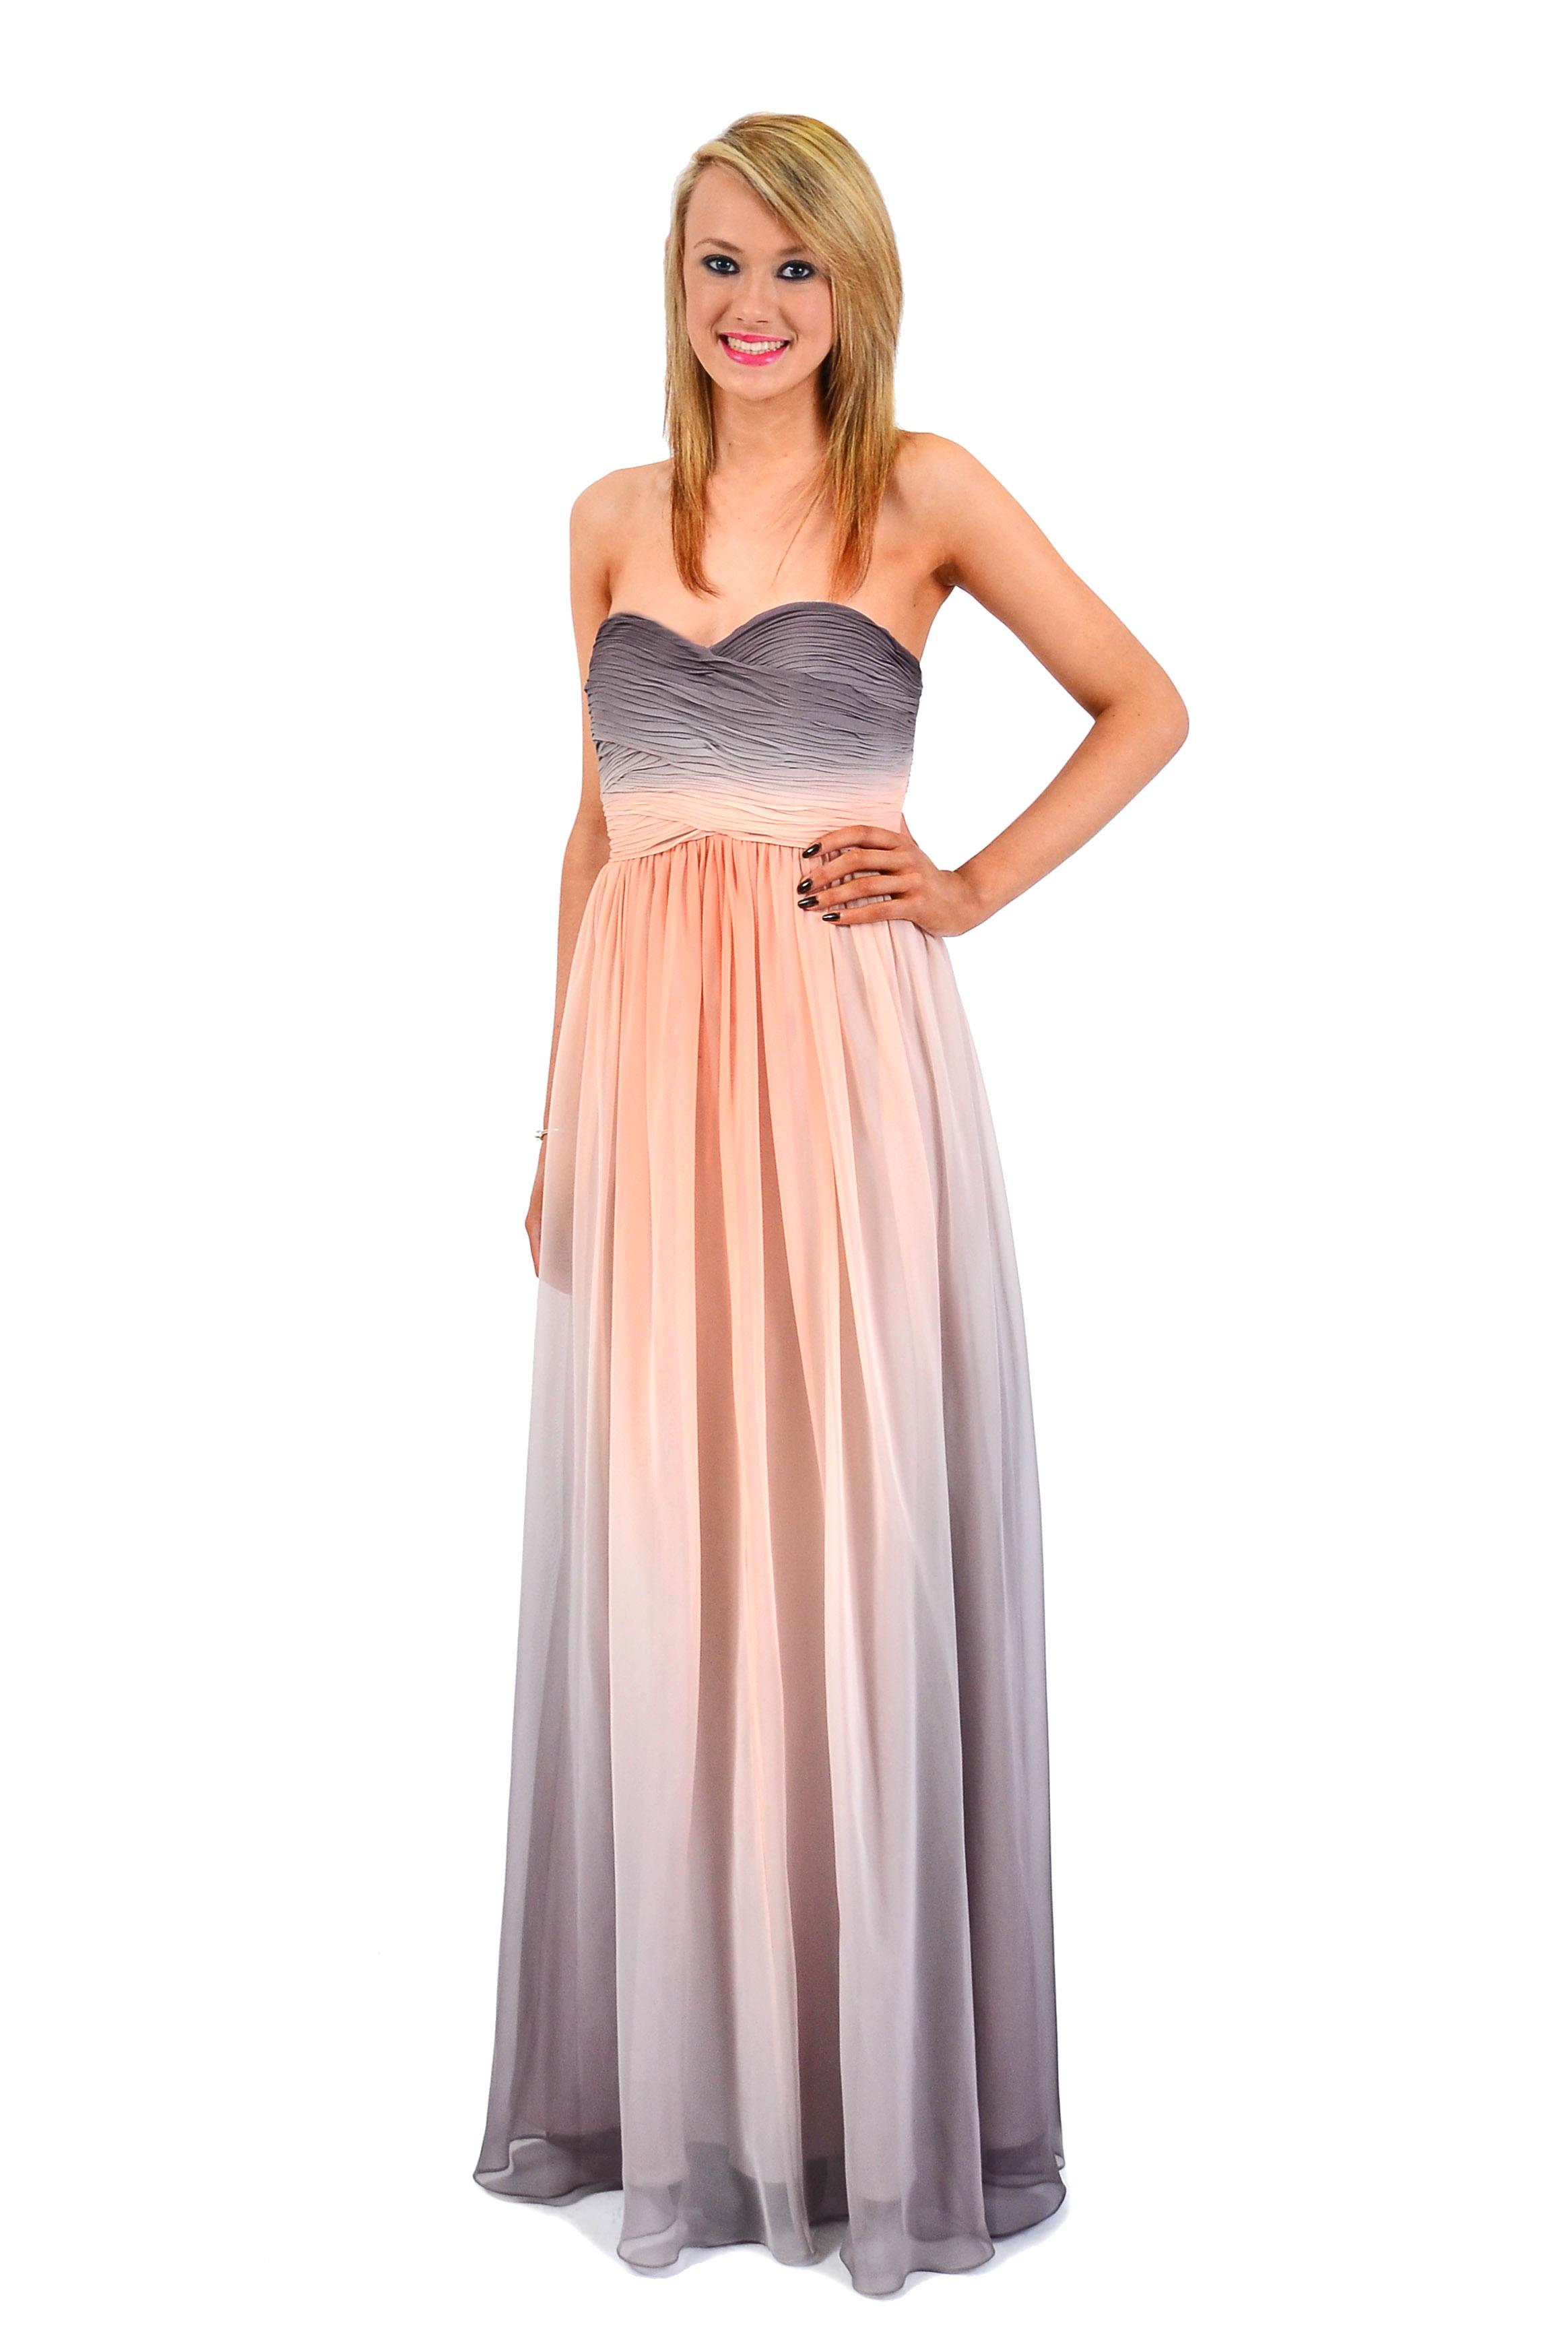 Source url: http://www.jourdanonline.net/more-fabulous-evening-dresses